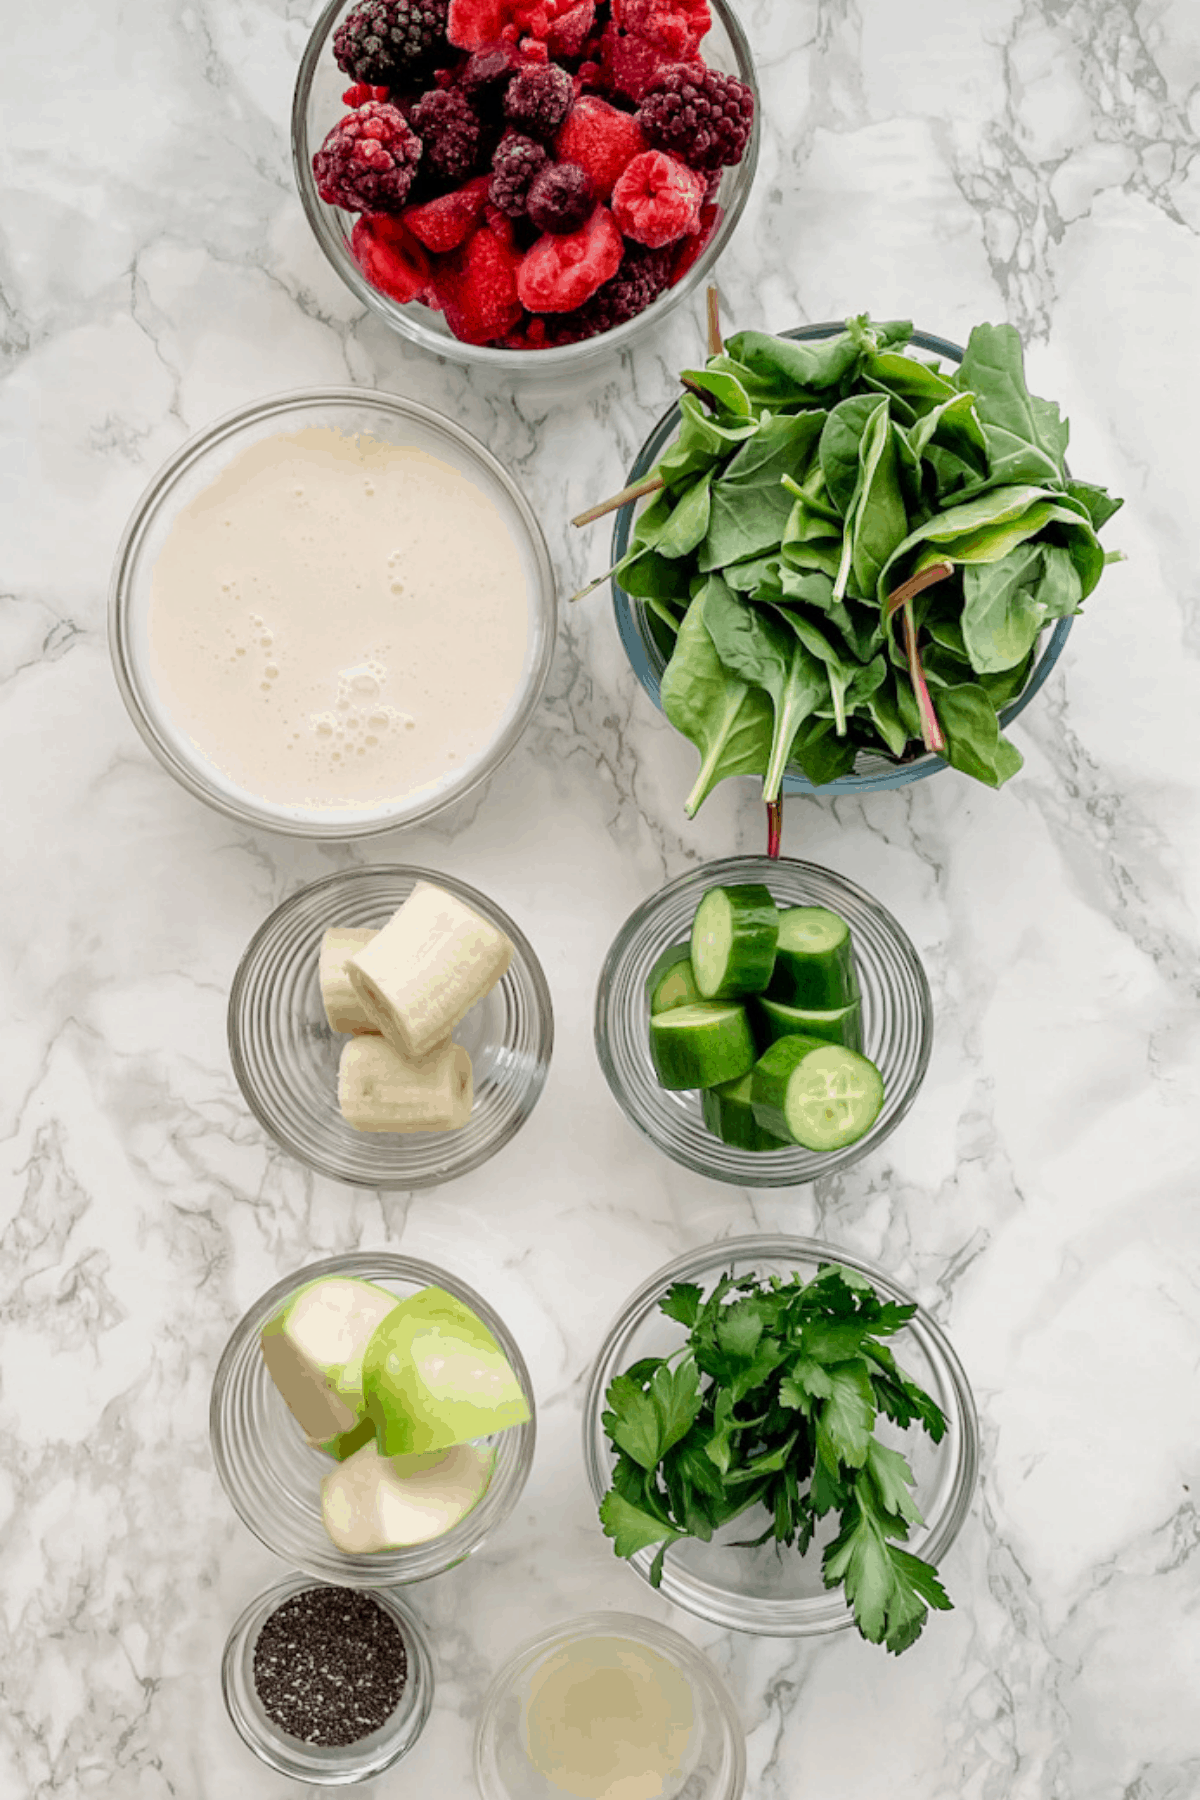 ingredients to make a detox smoothie